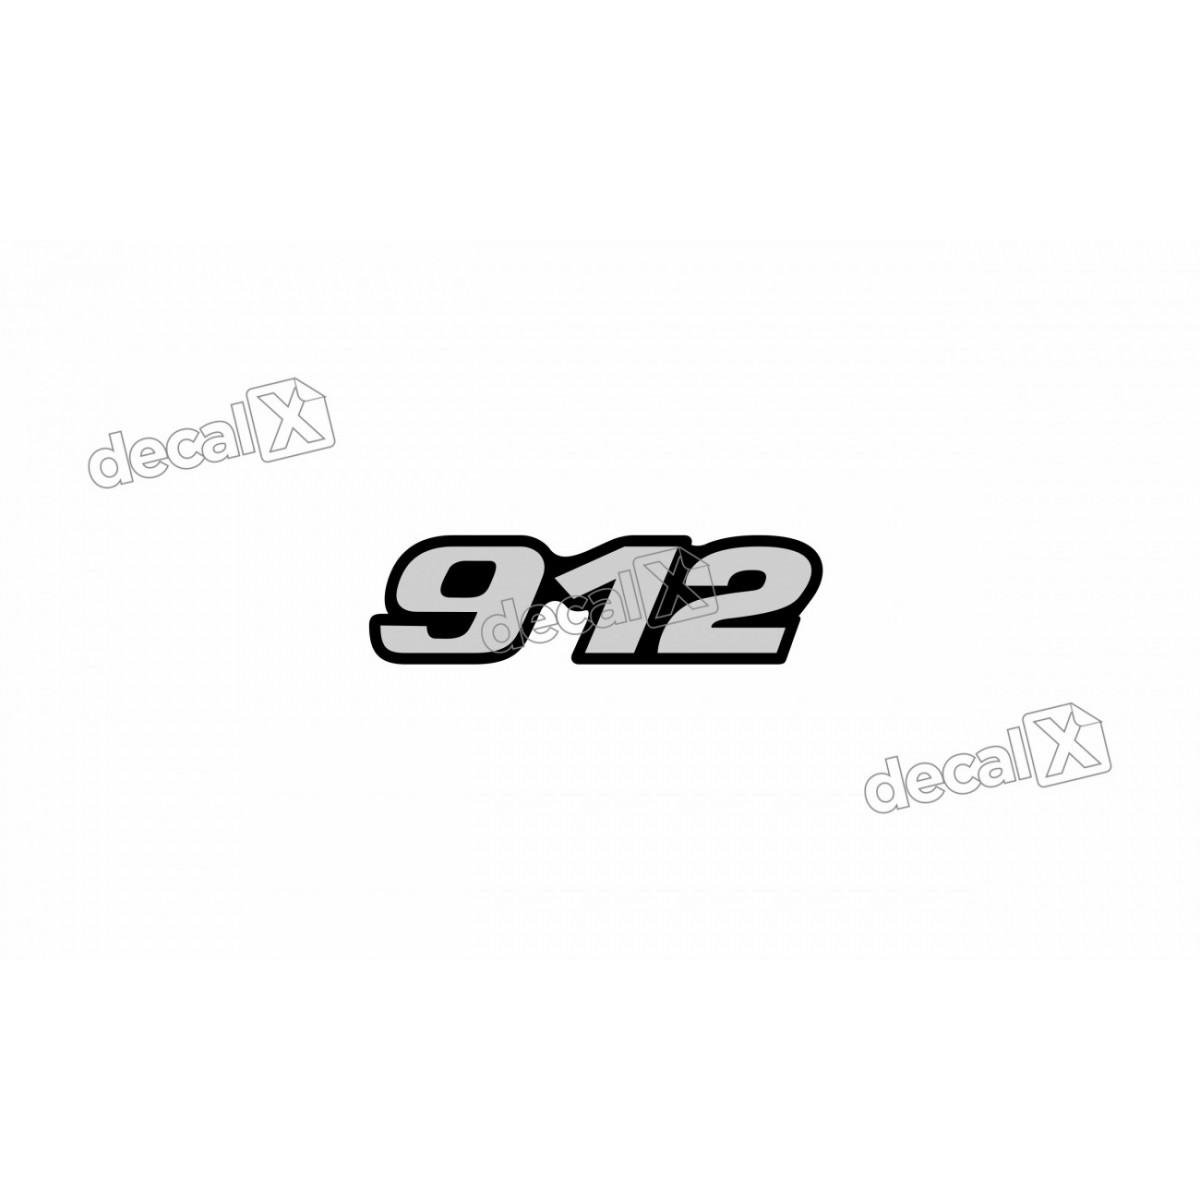 Adesivo Emblema Resinado Mercedes 912 Cm12 Decalx